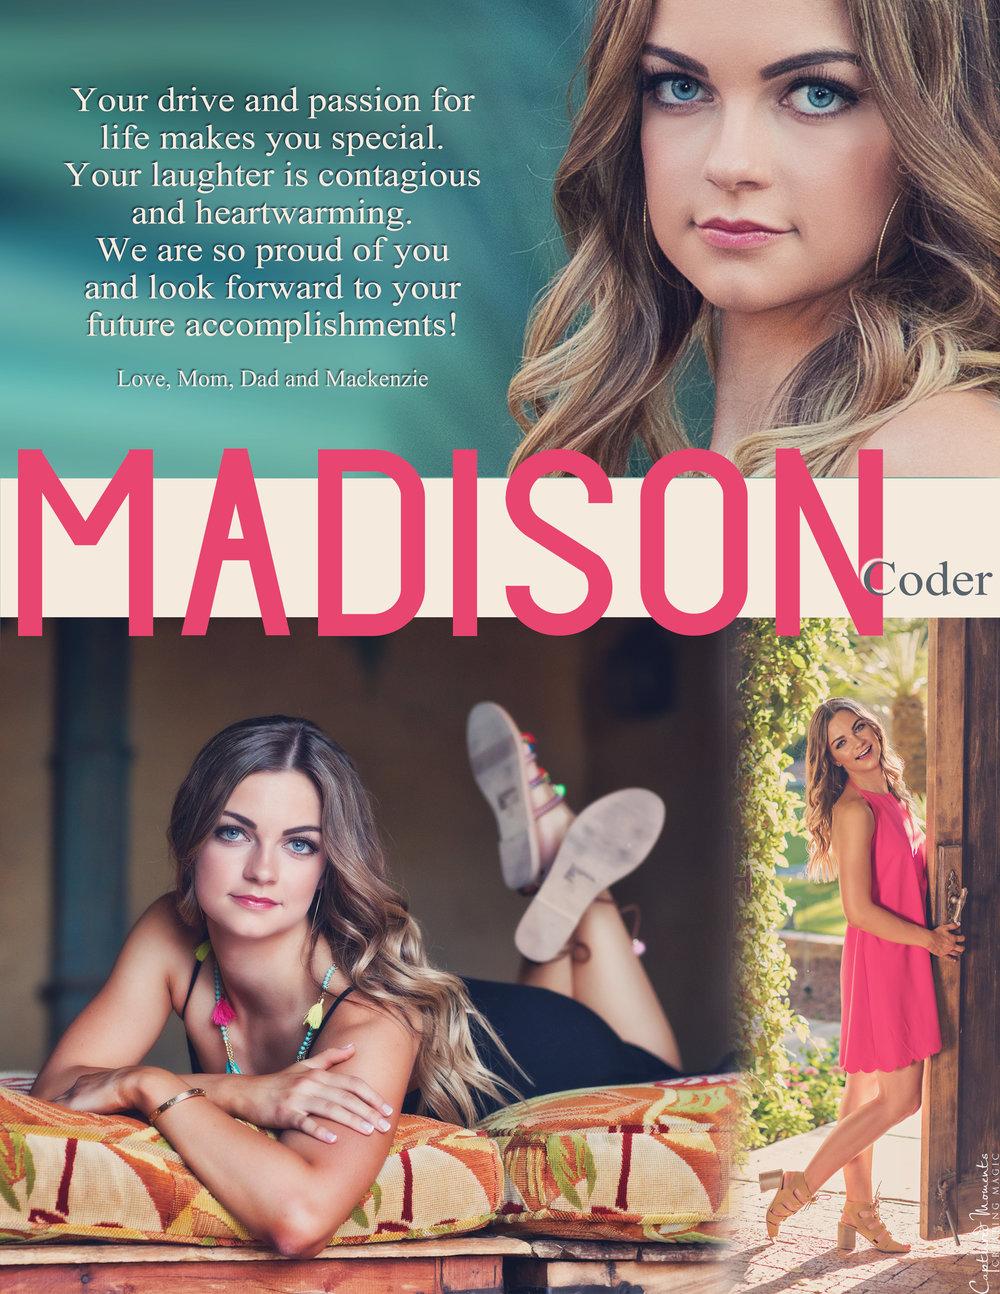 Madison Coder.jpg